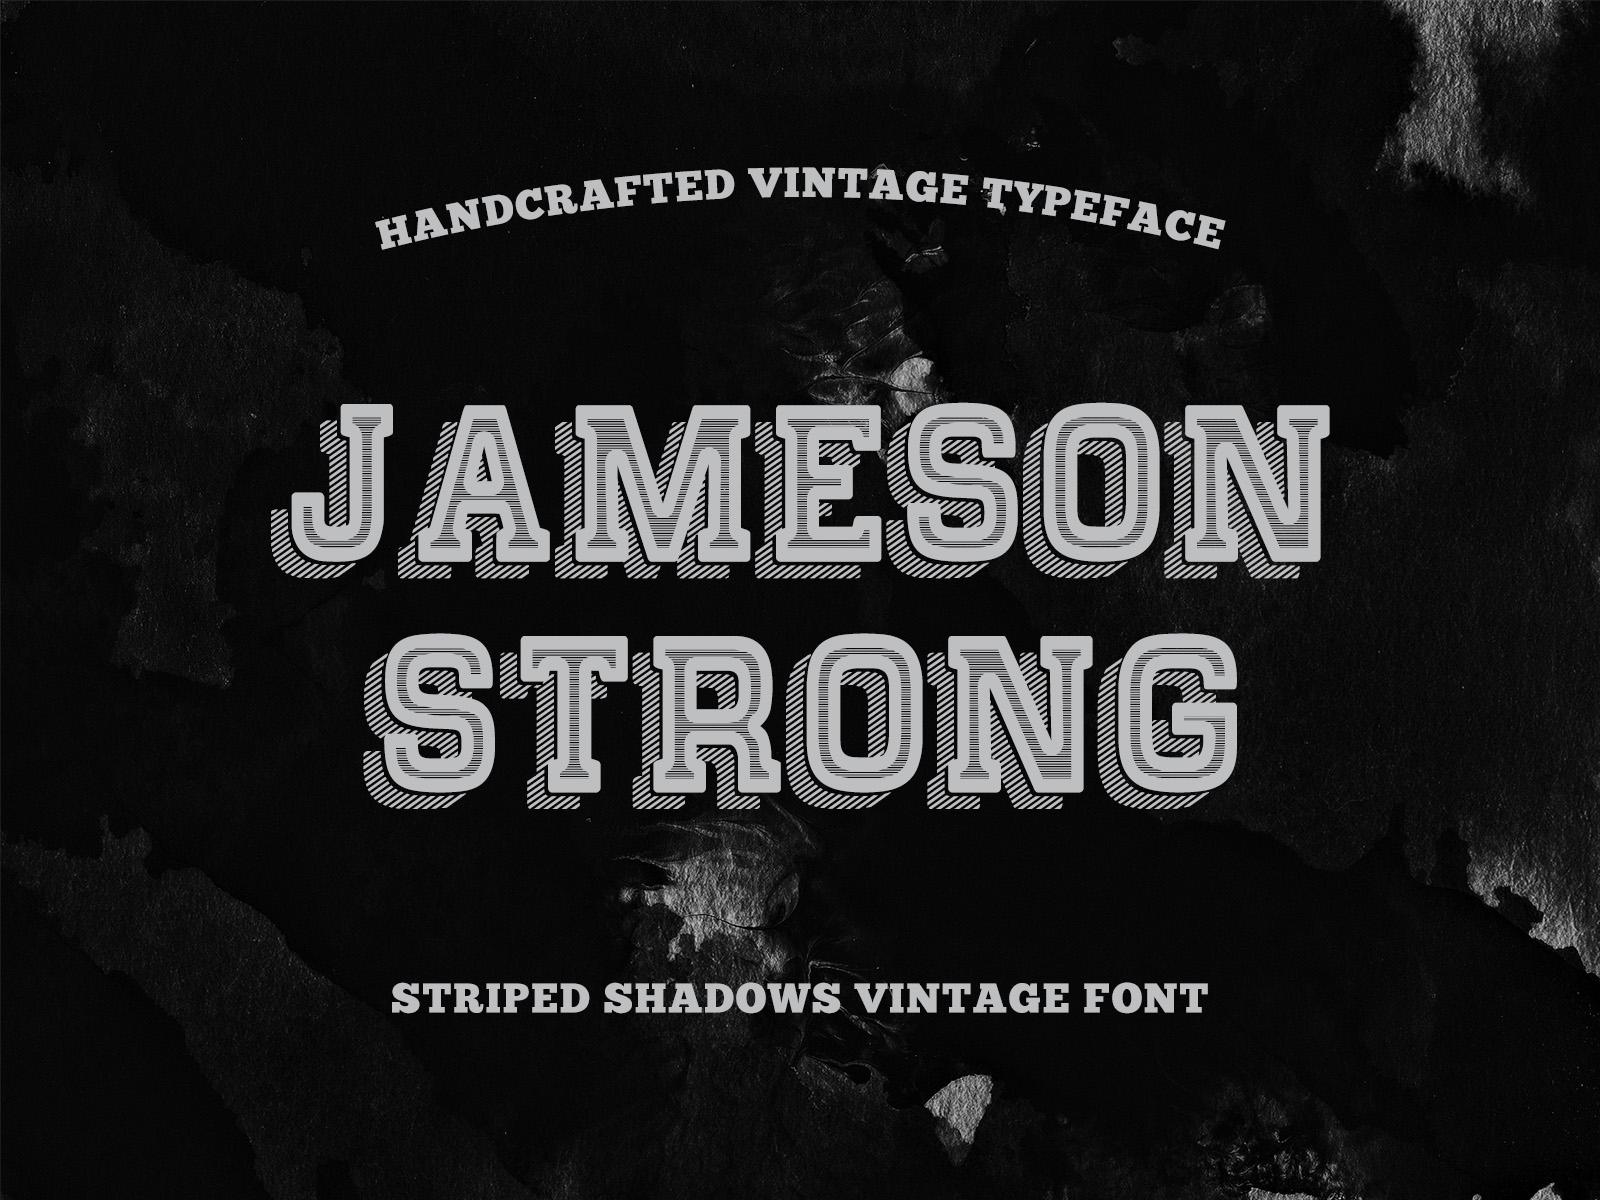 Shadow stripes vintage typeface